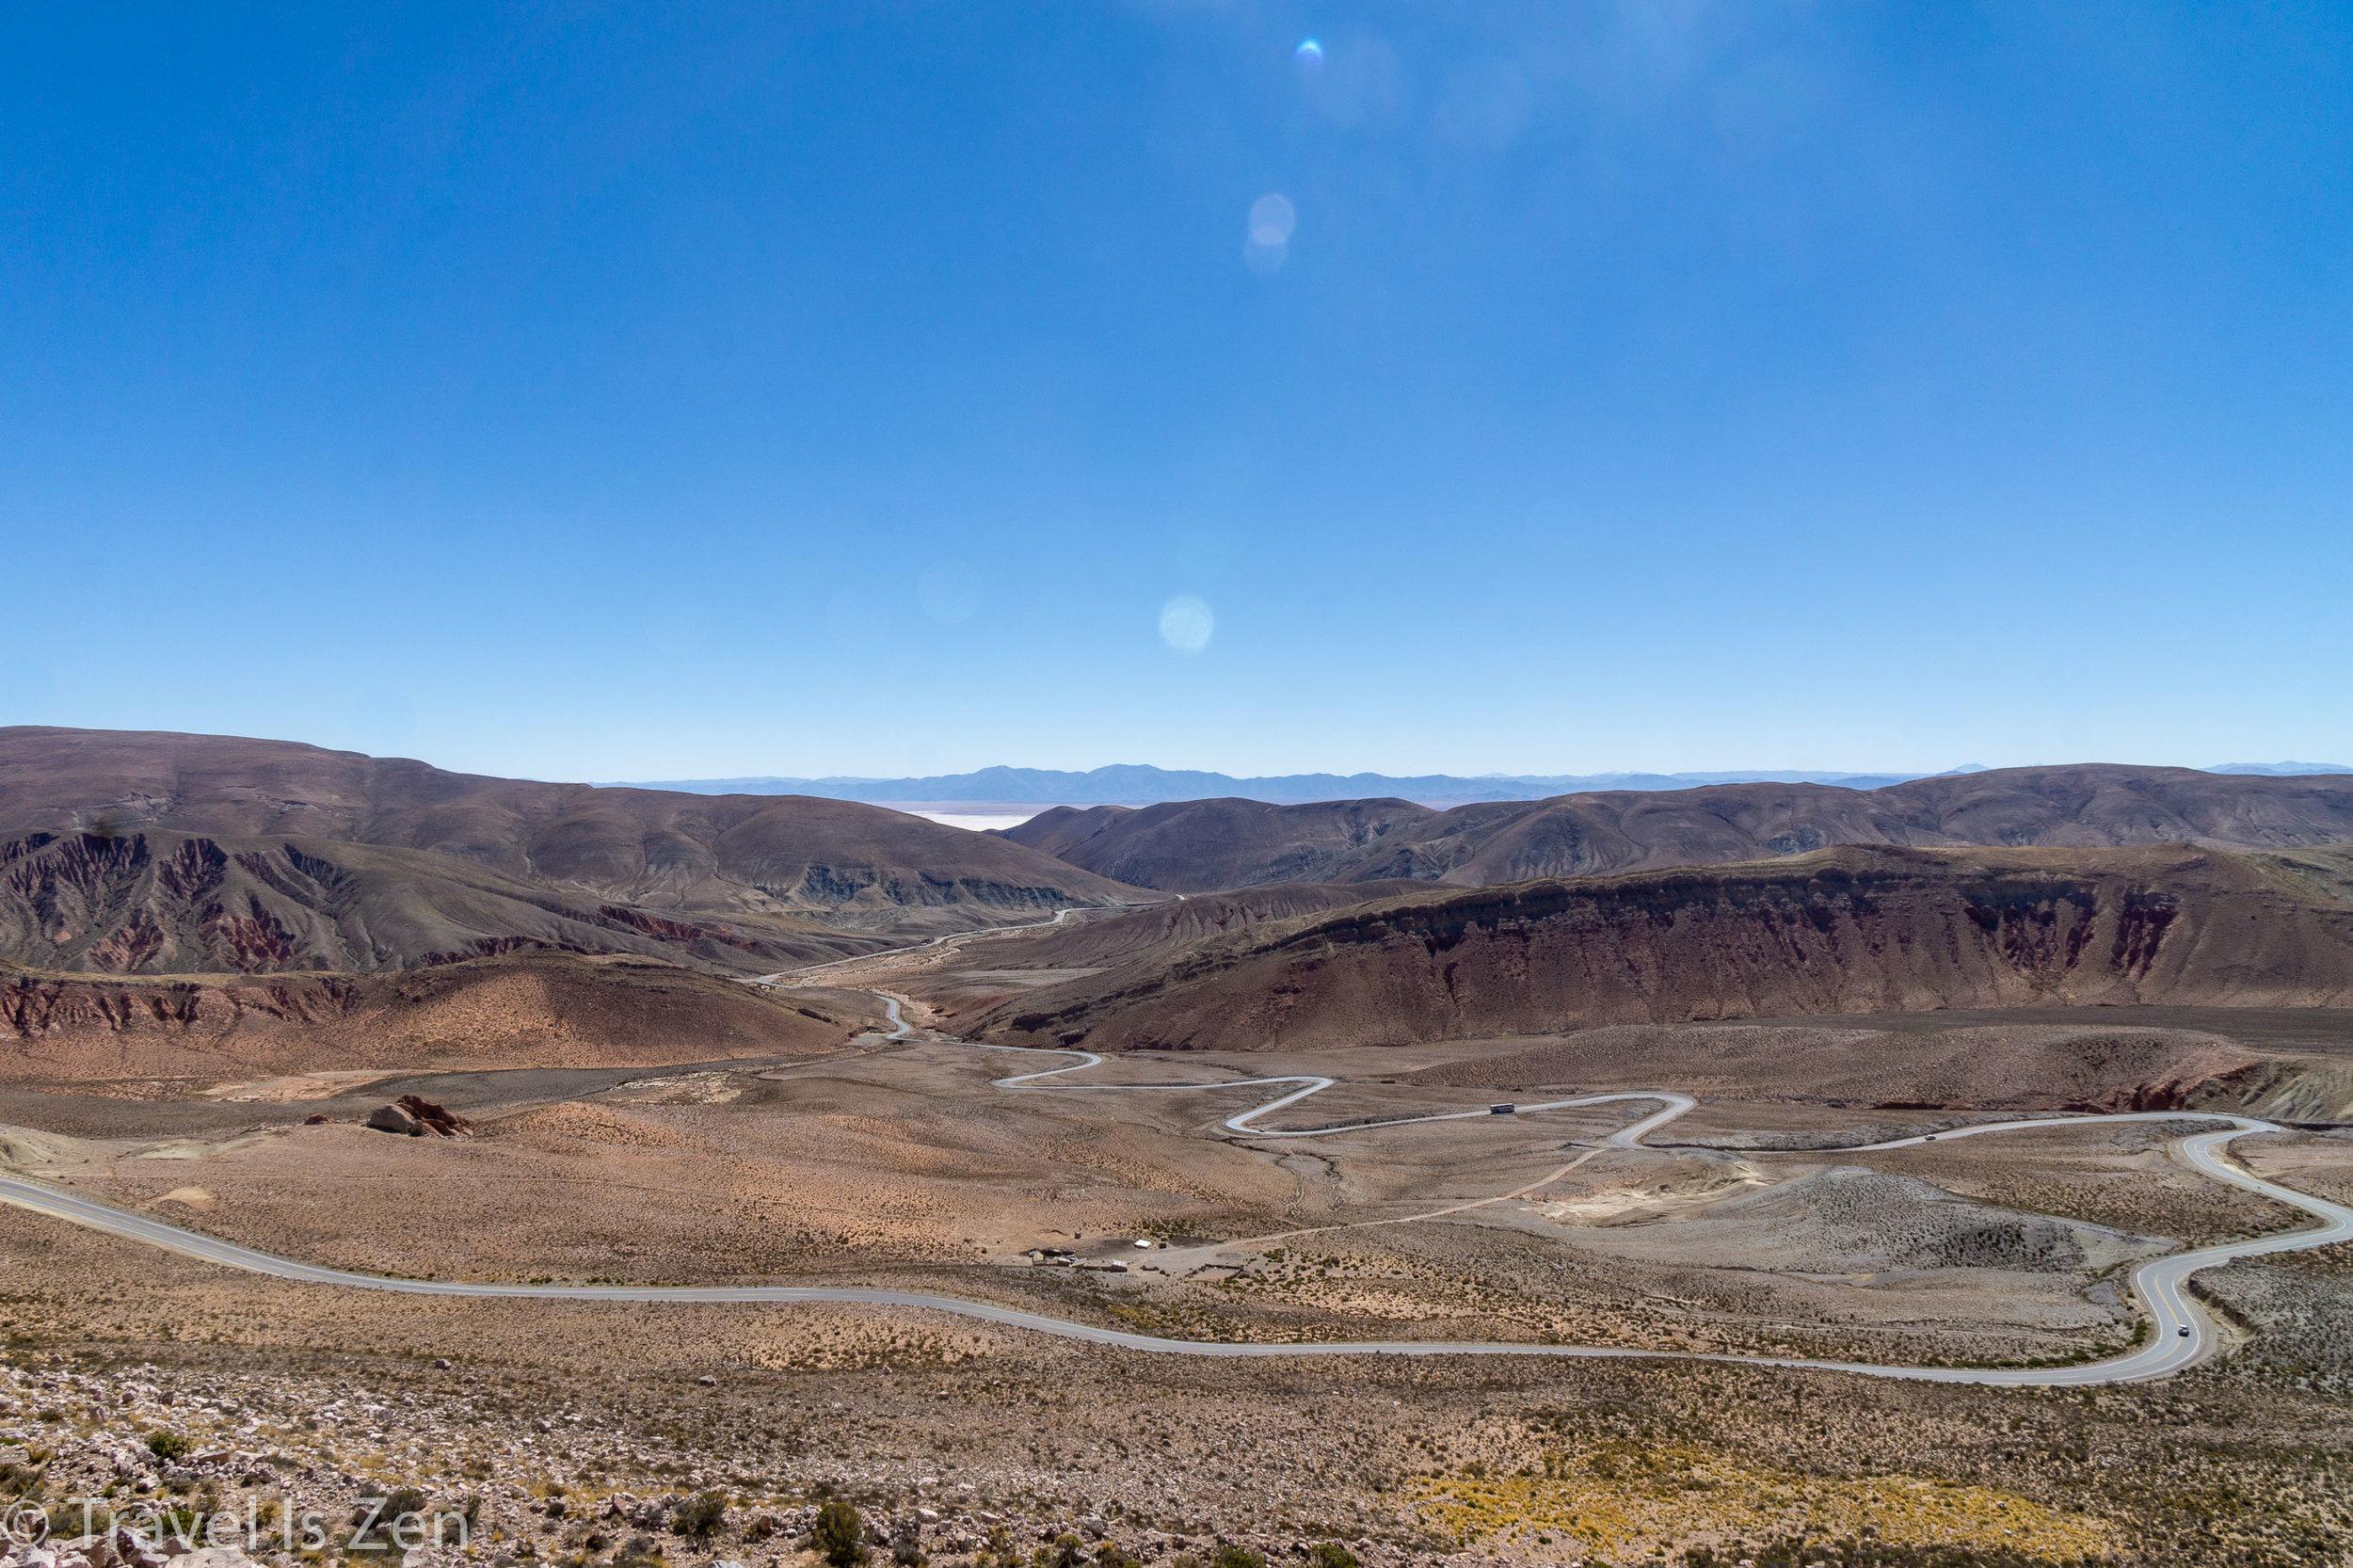 Descending the Lipán Slope towards Salinas Grandes